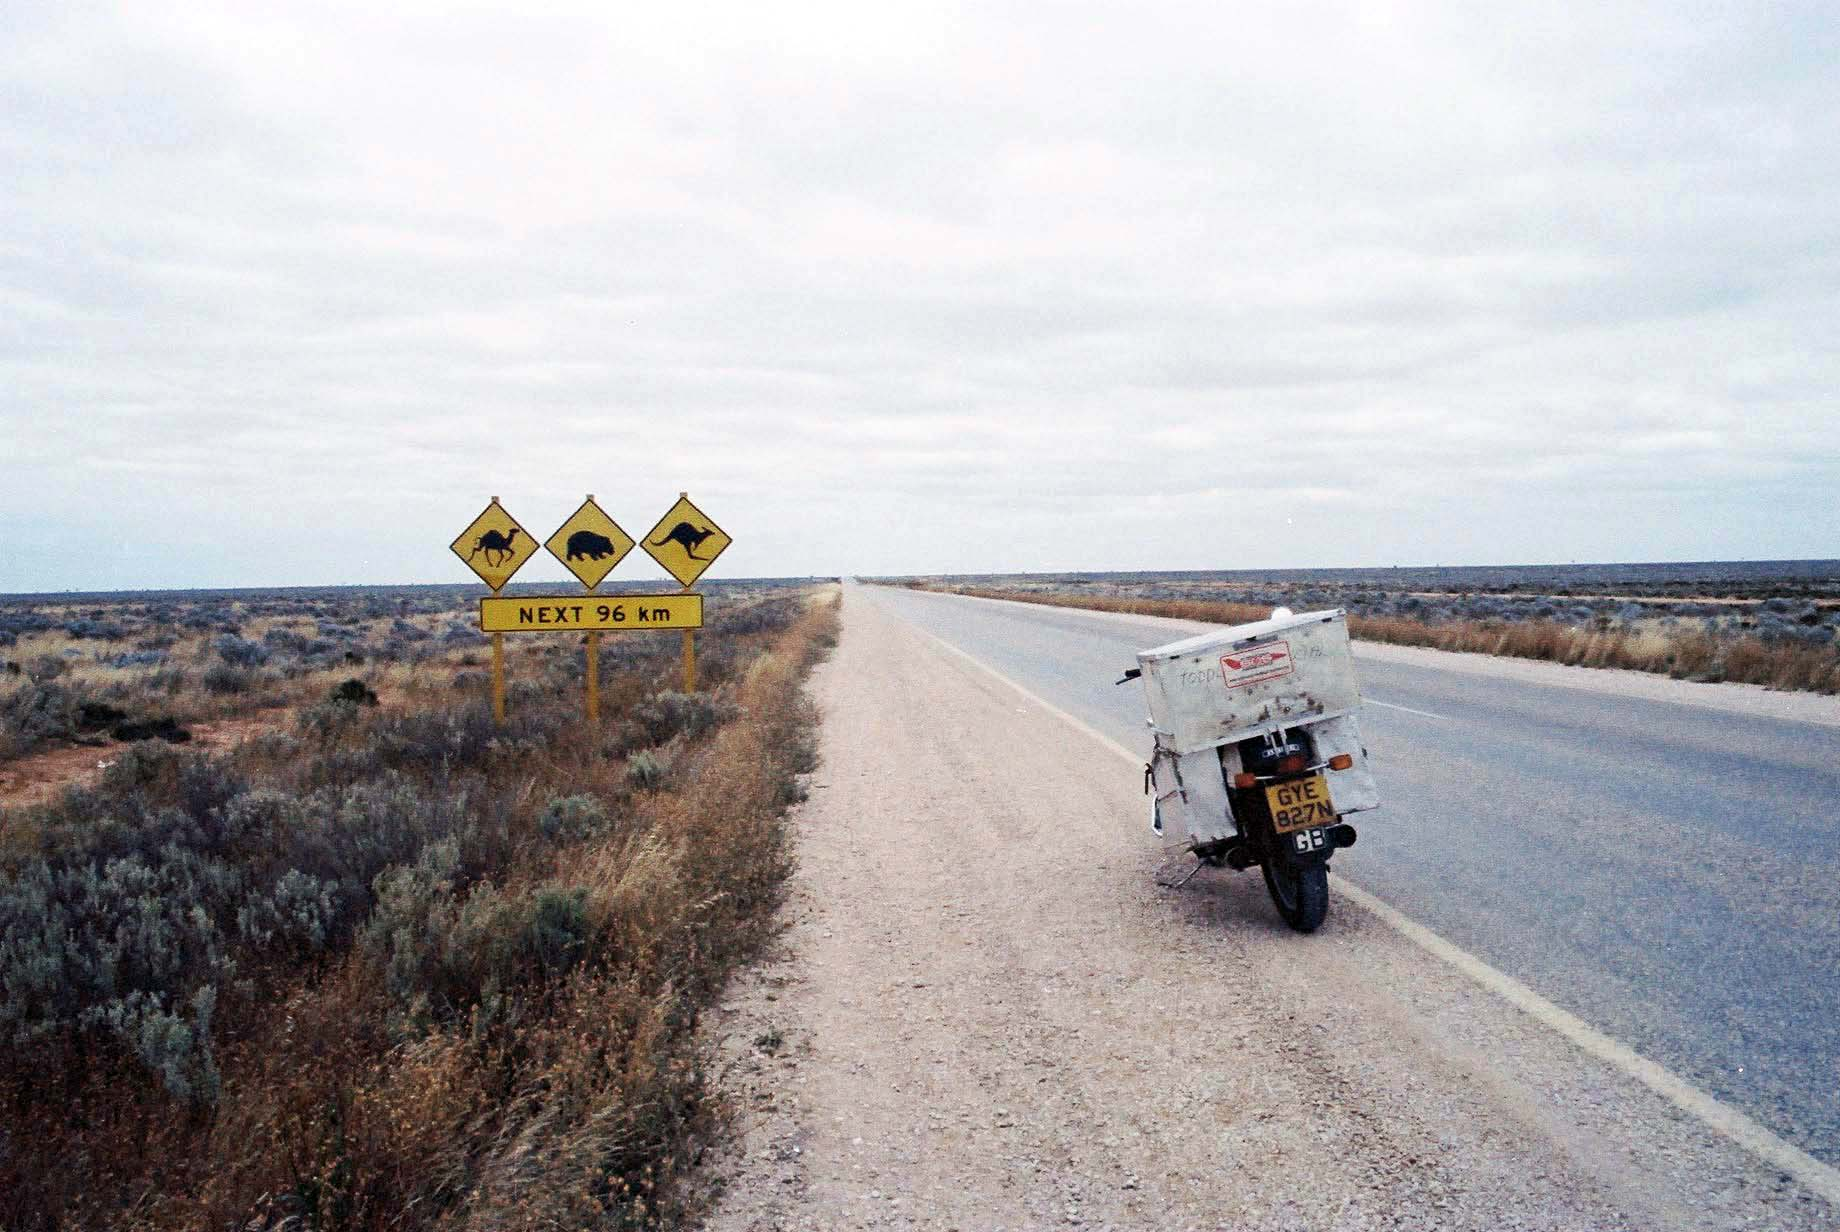 18. Western Australia